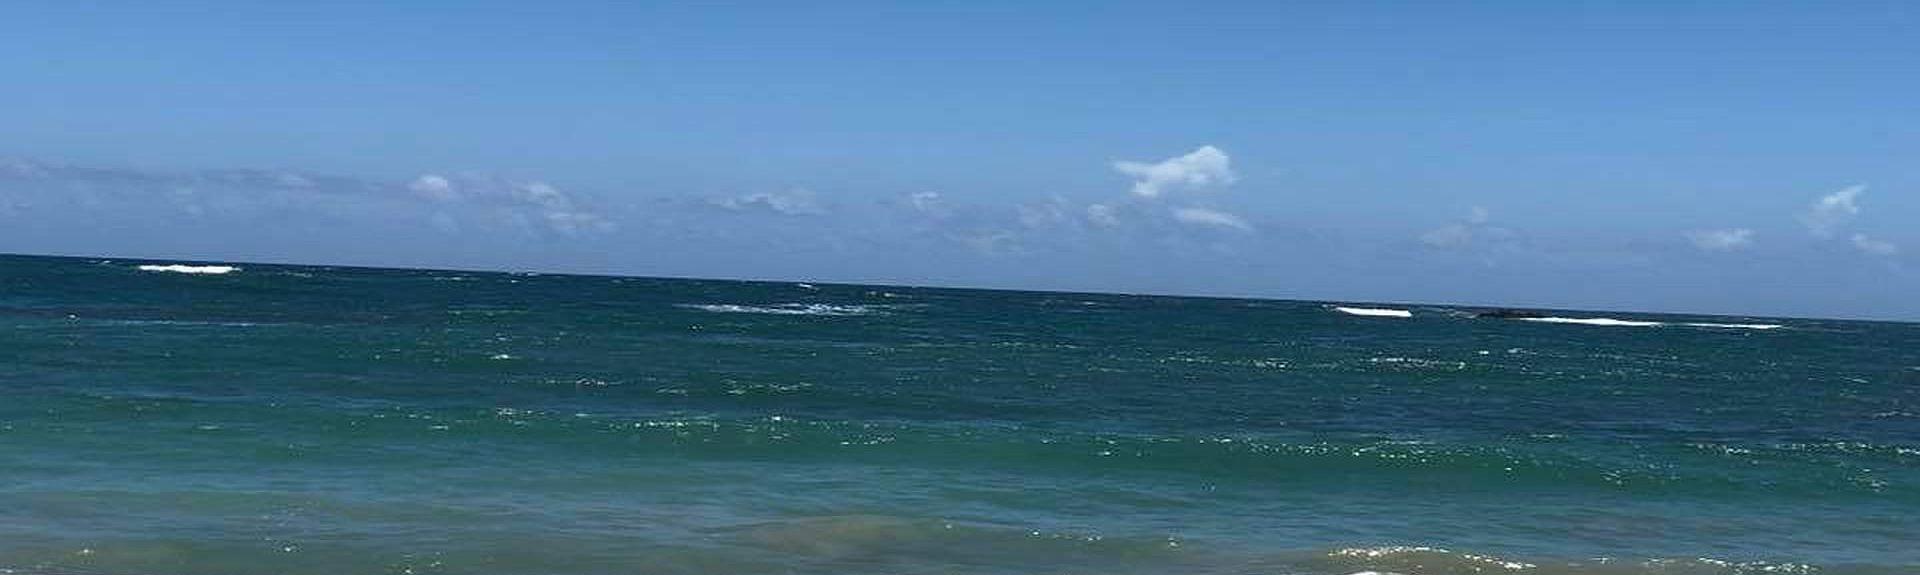 Villas of Cofresi Beach (Puerto Plata, Puerto Plata Province, Dominican Republic)